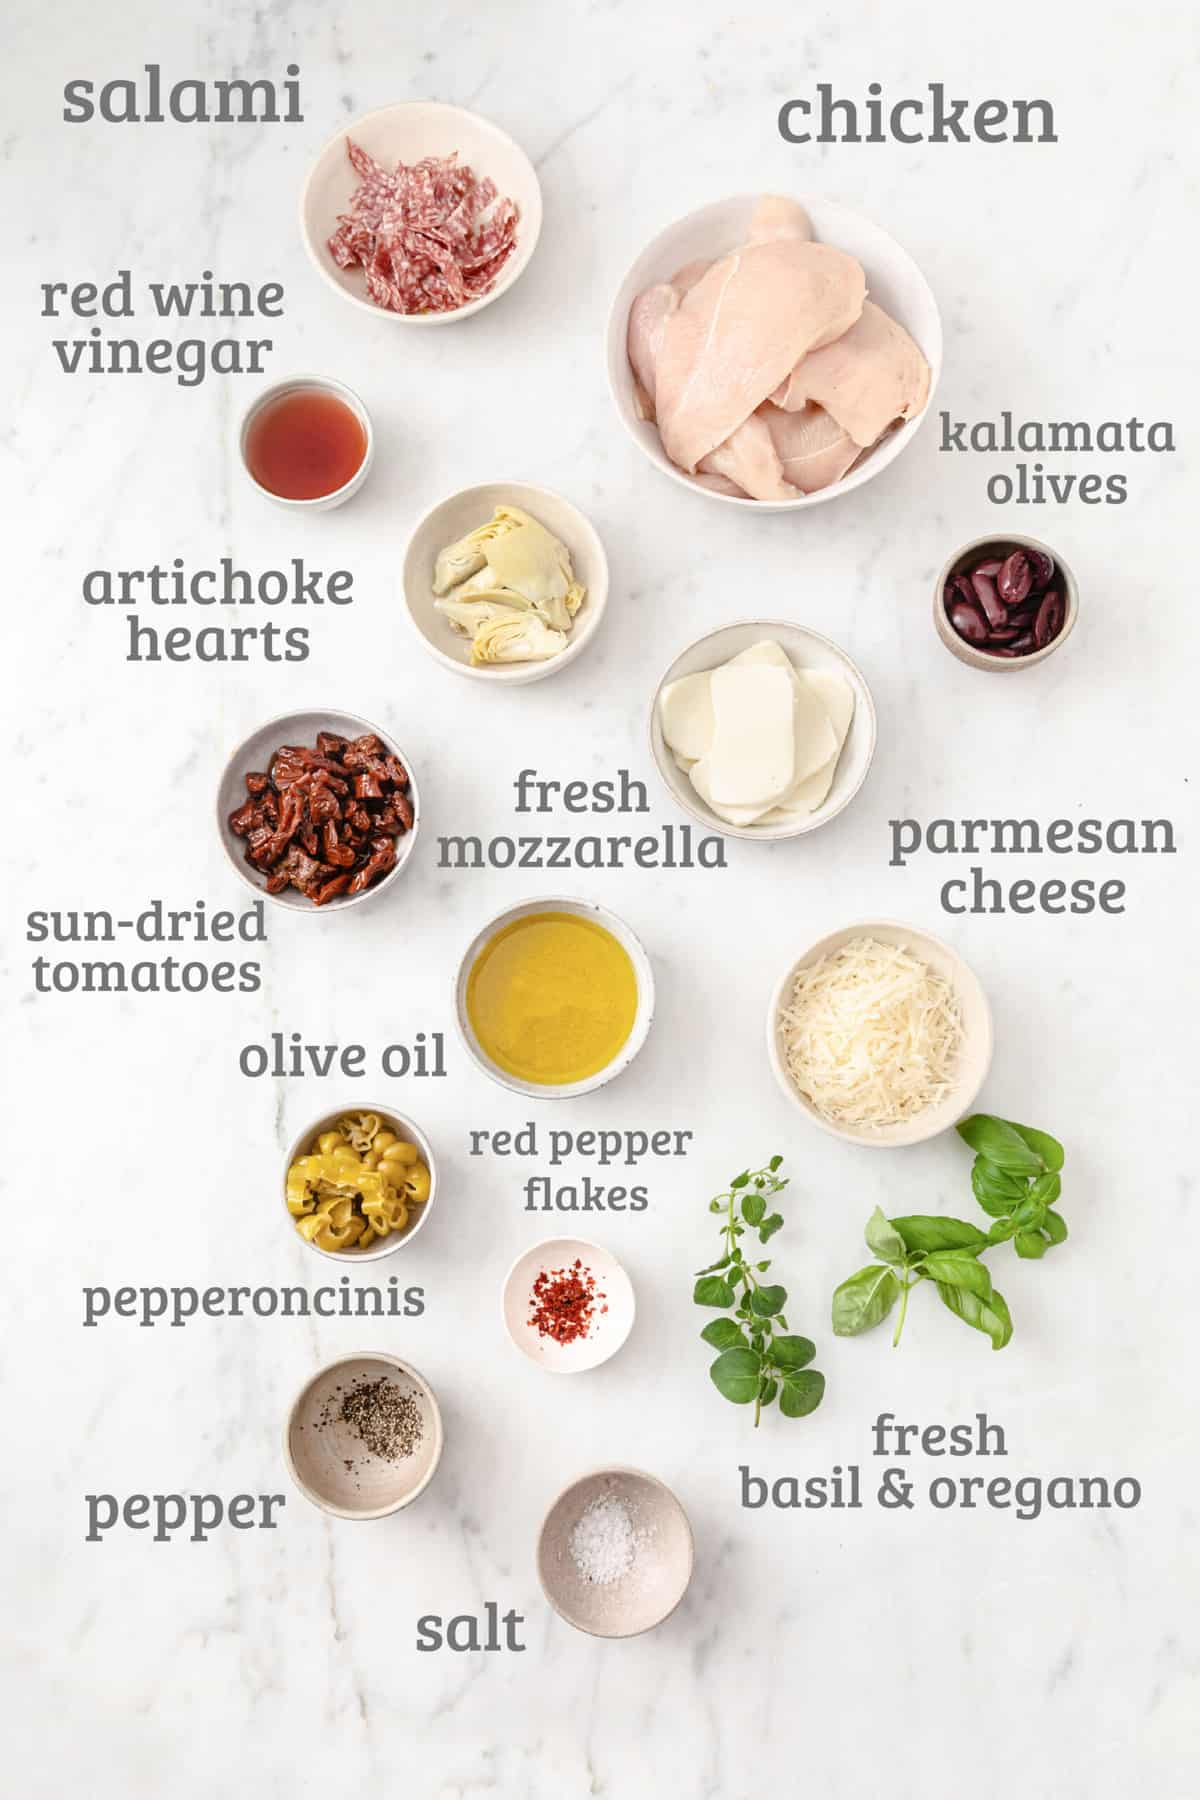 Ingredients for Antipasto Chicken - chicken, salami, artichokes, tomatoes, garlic, olives, basil, cheese, oregano, vinegar, garlic